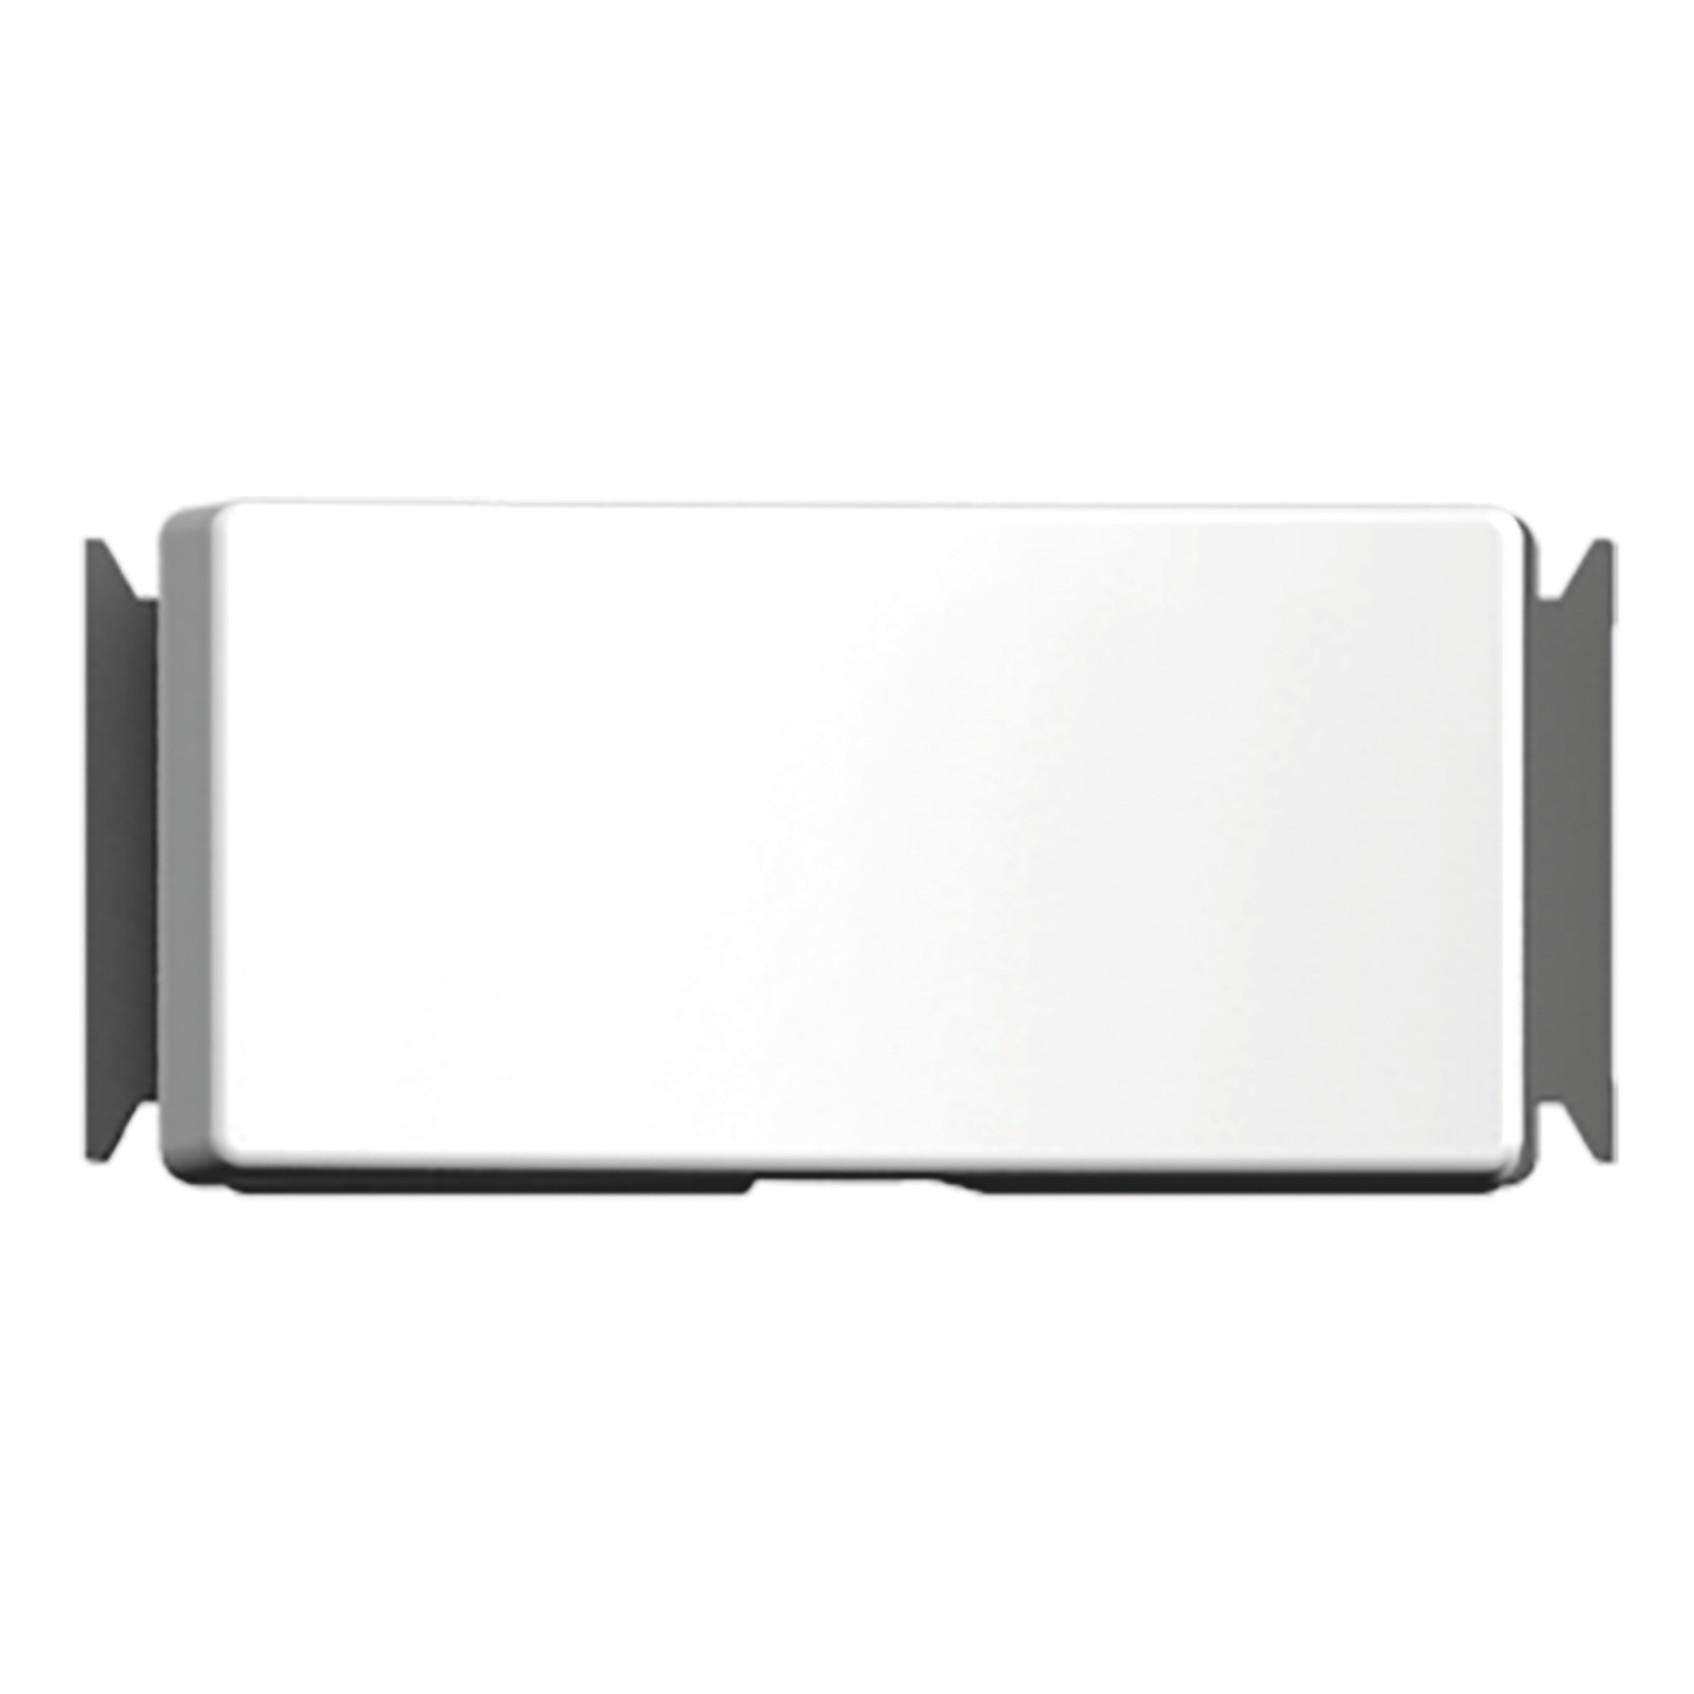 Modulo Interruptor Simples 6A Branco 57217001 Aria - Tramontina